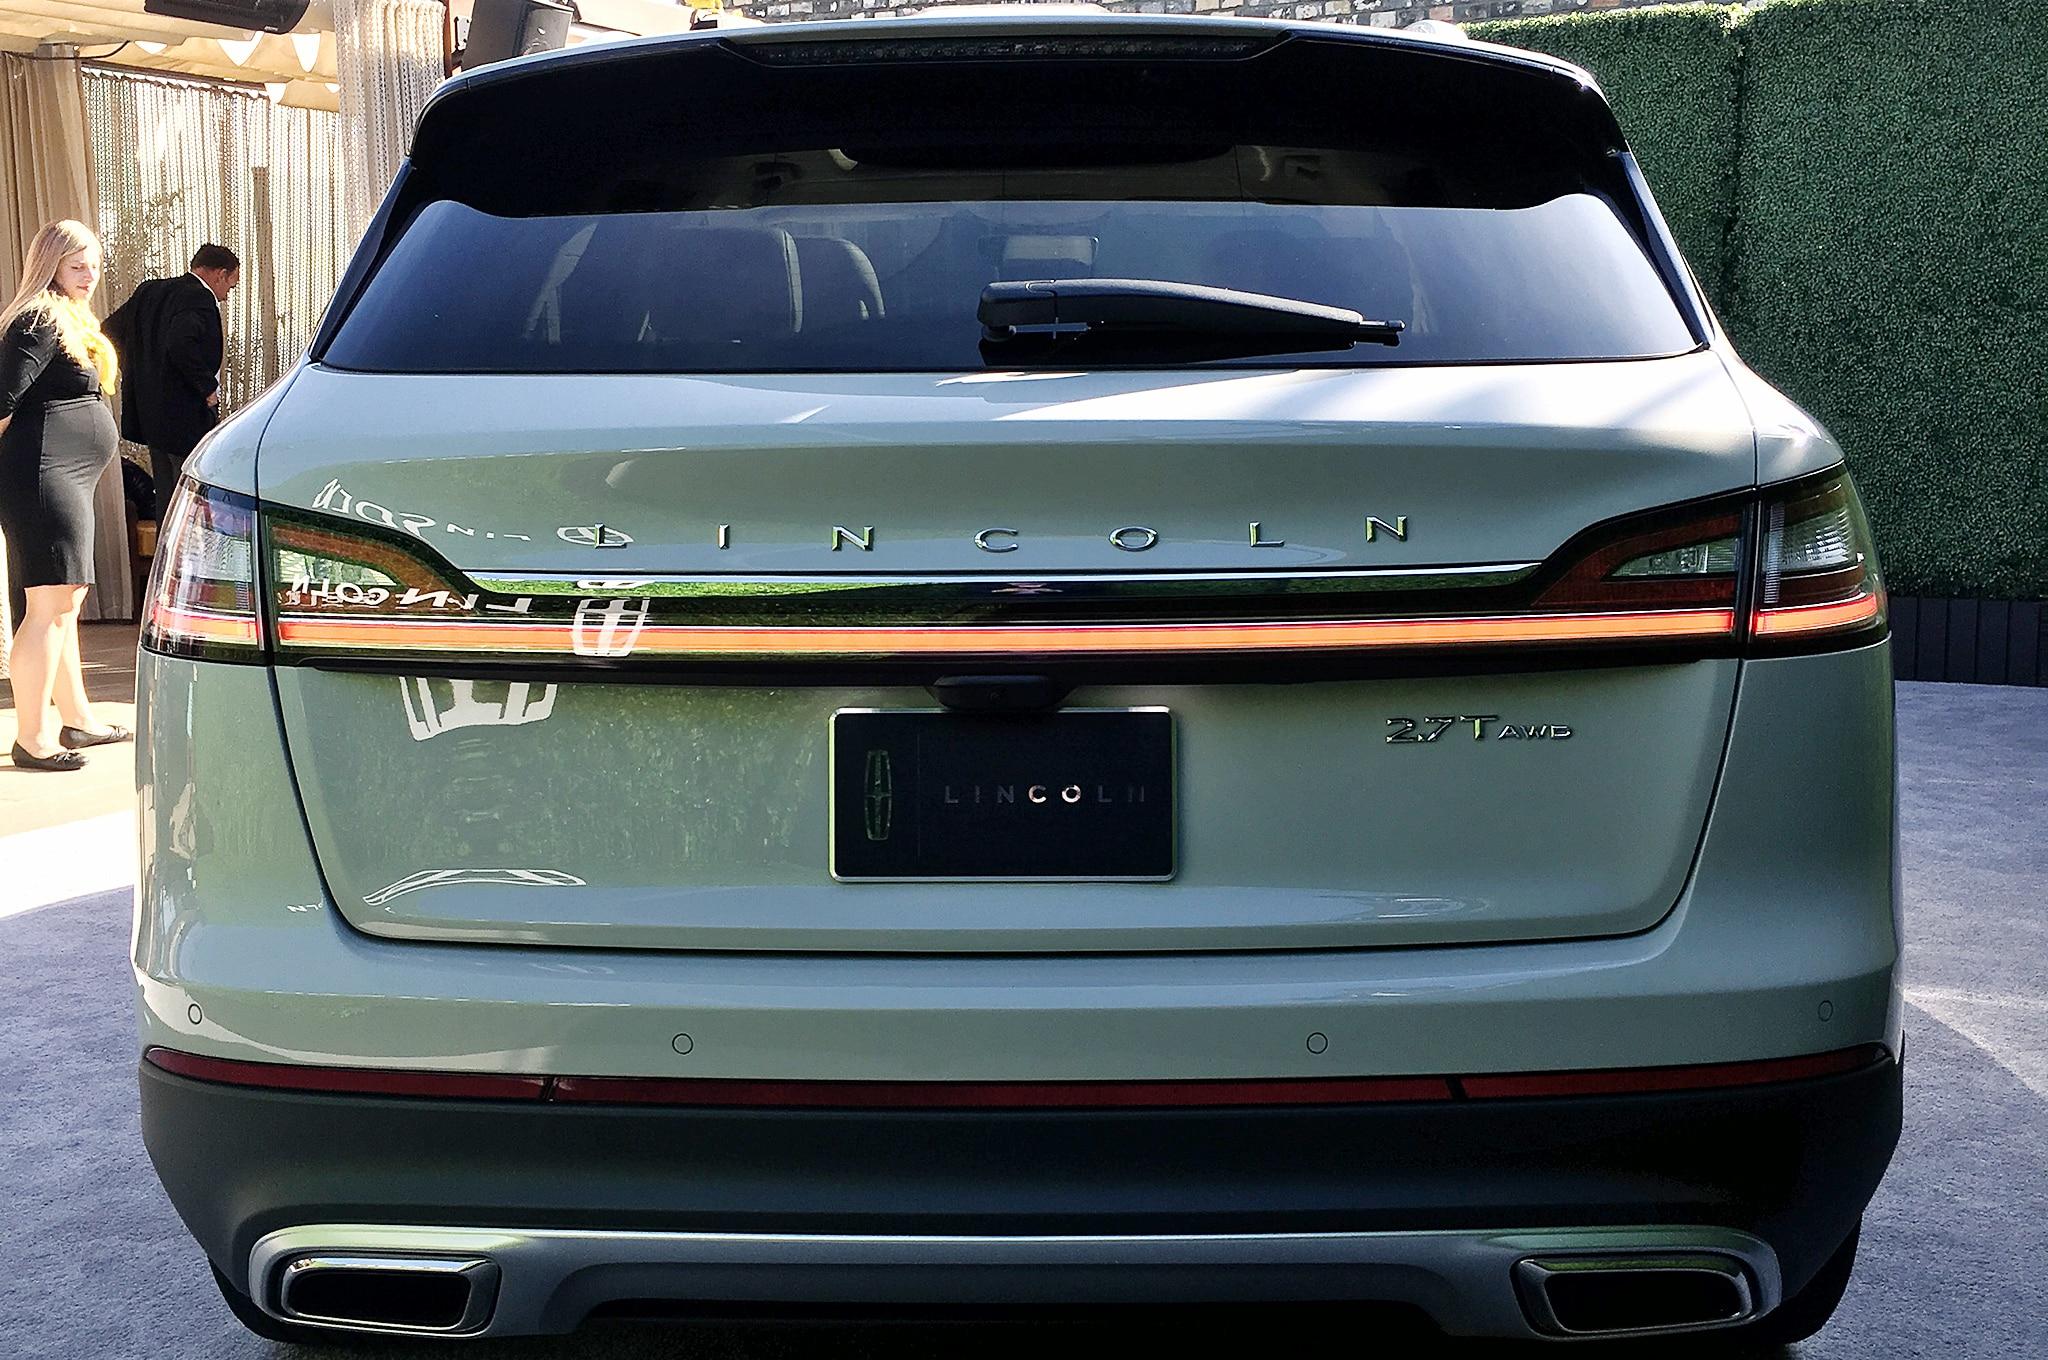 http://st.automobilemag.com/uploads/sites/11/2017/11/2019-lincoln-nautilus-live-rear-view.jpg